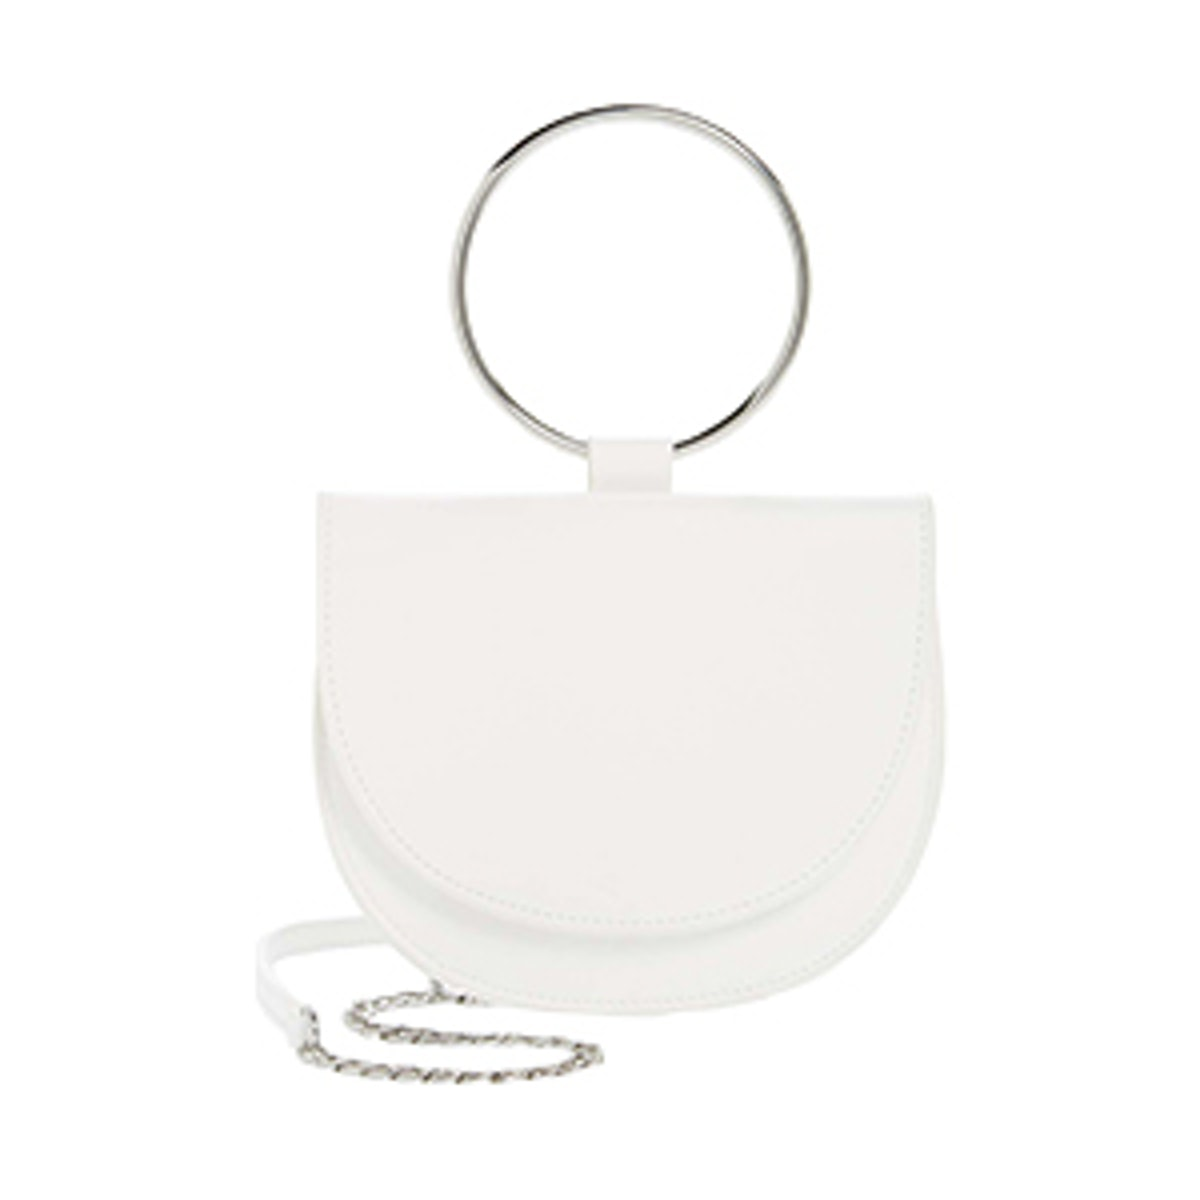 Reese Ring Crossbody Bag